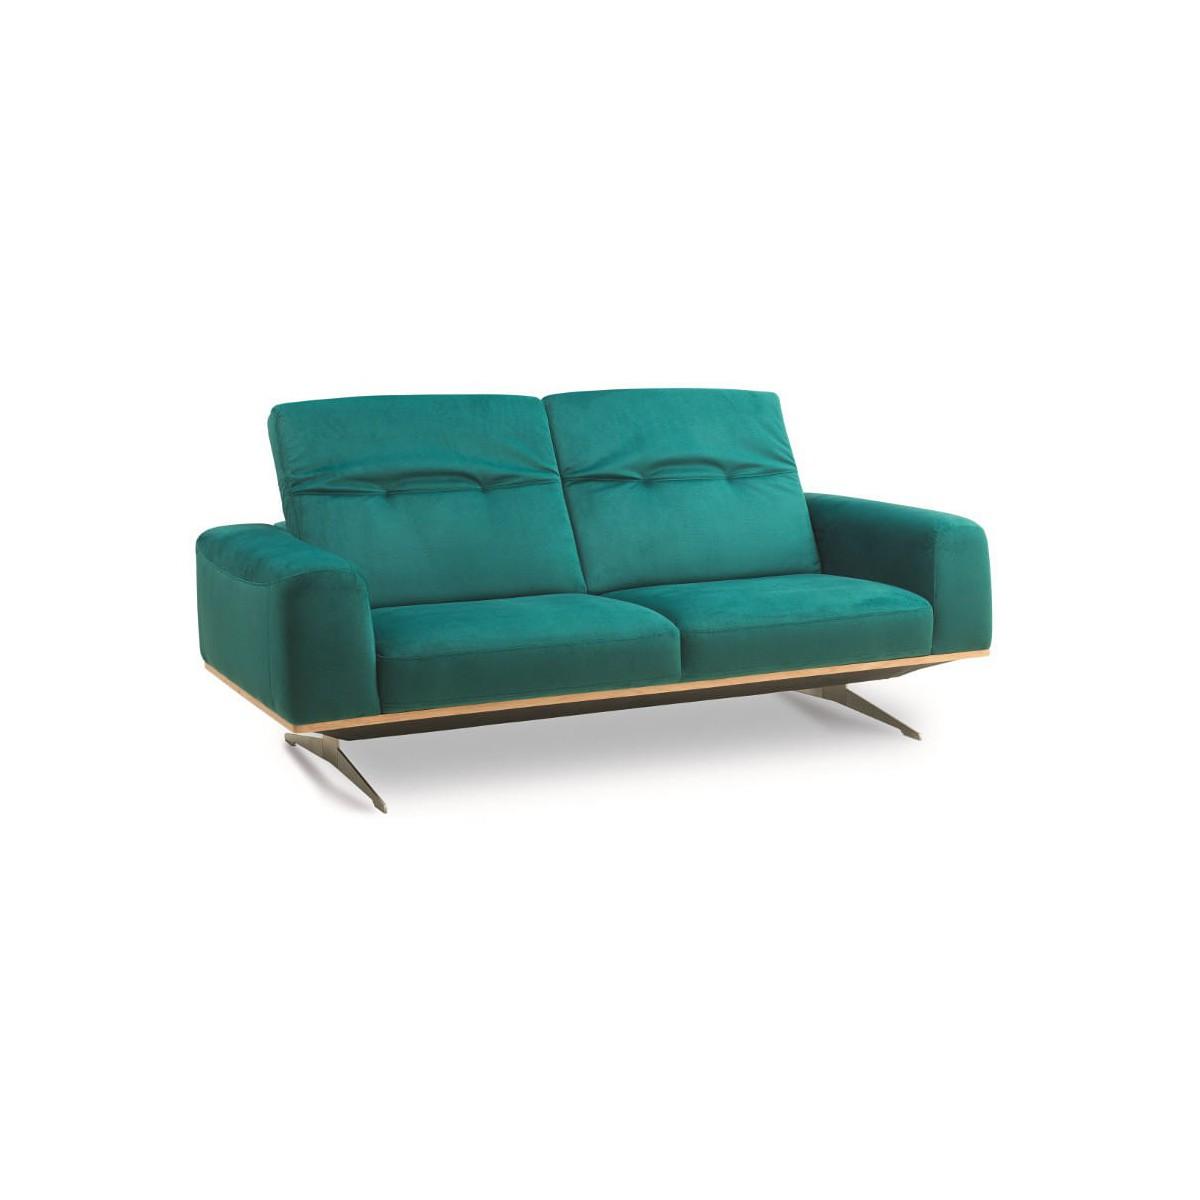 Astro sofa